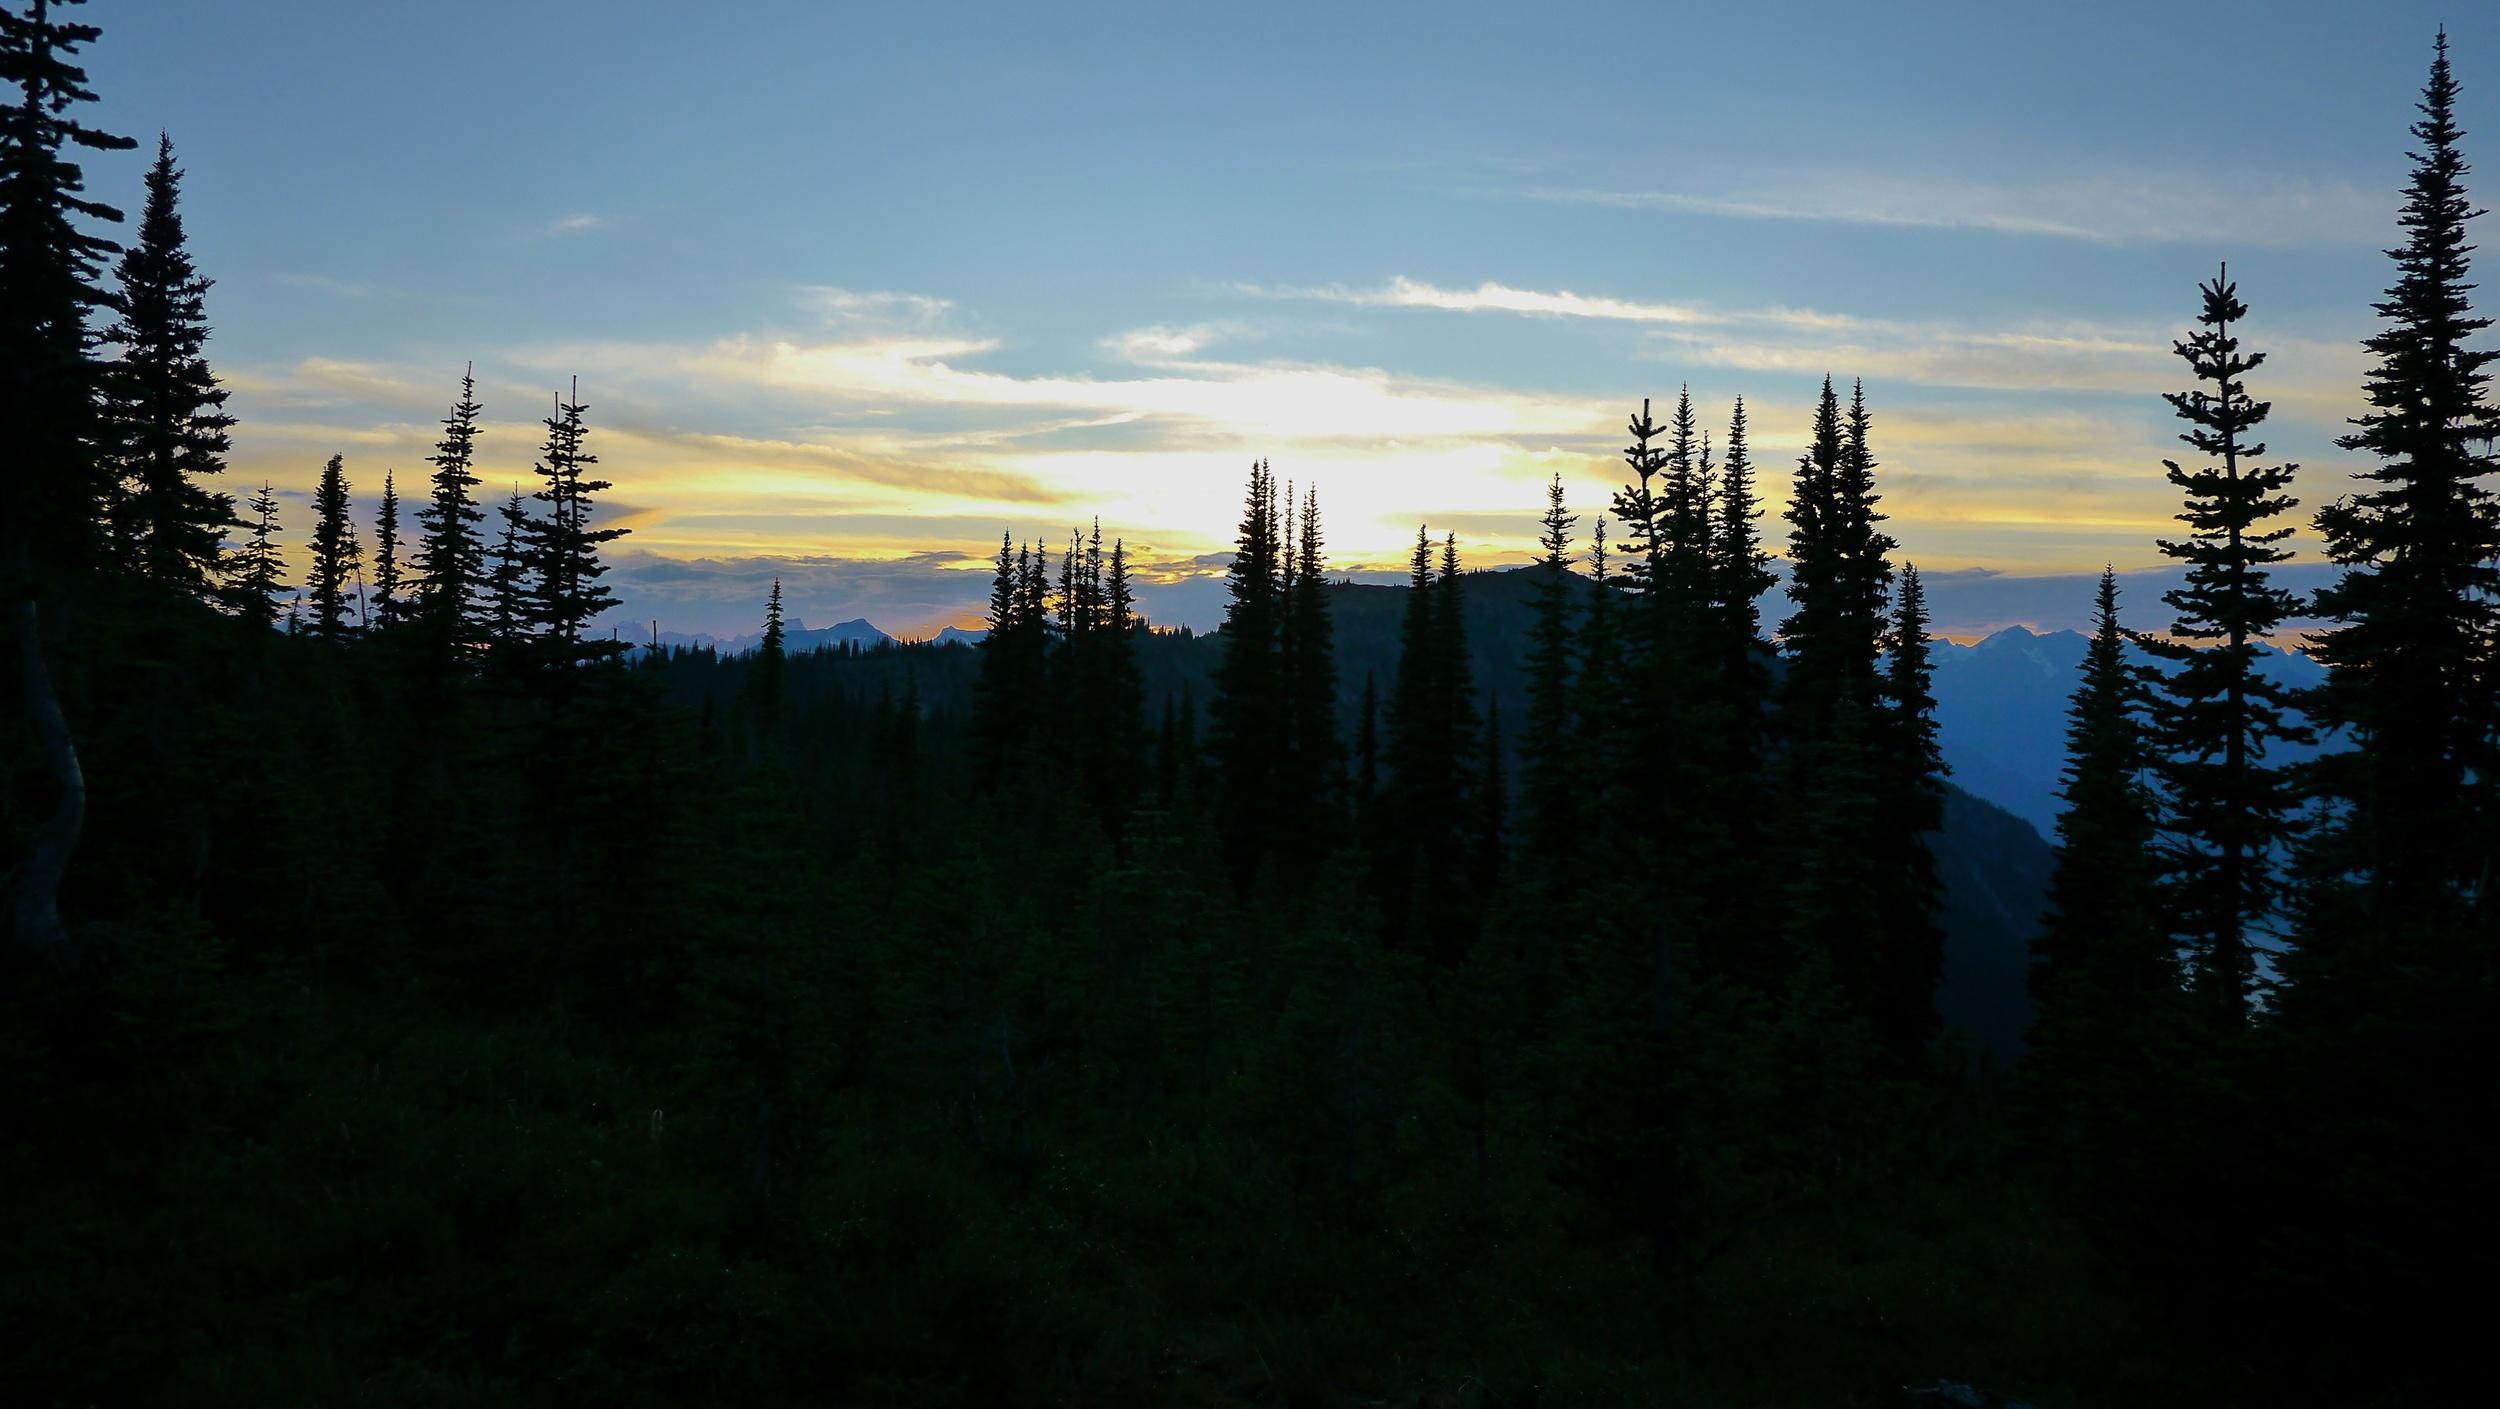 sunset at Dry Creek pass